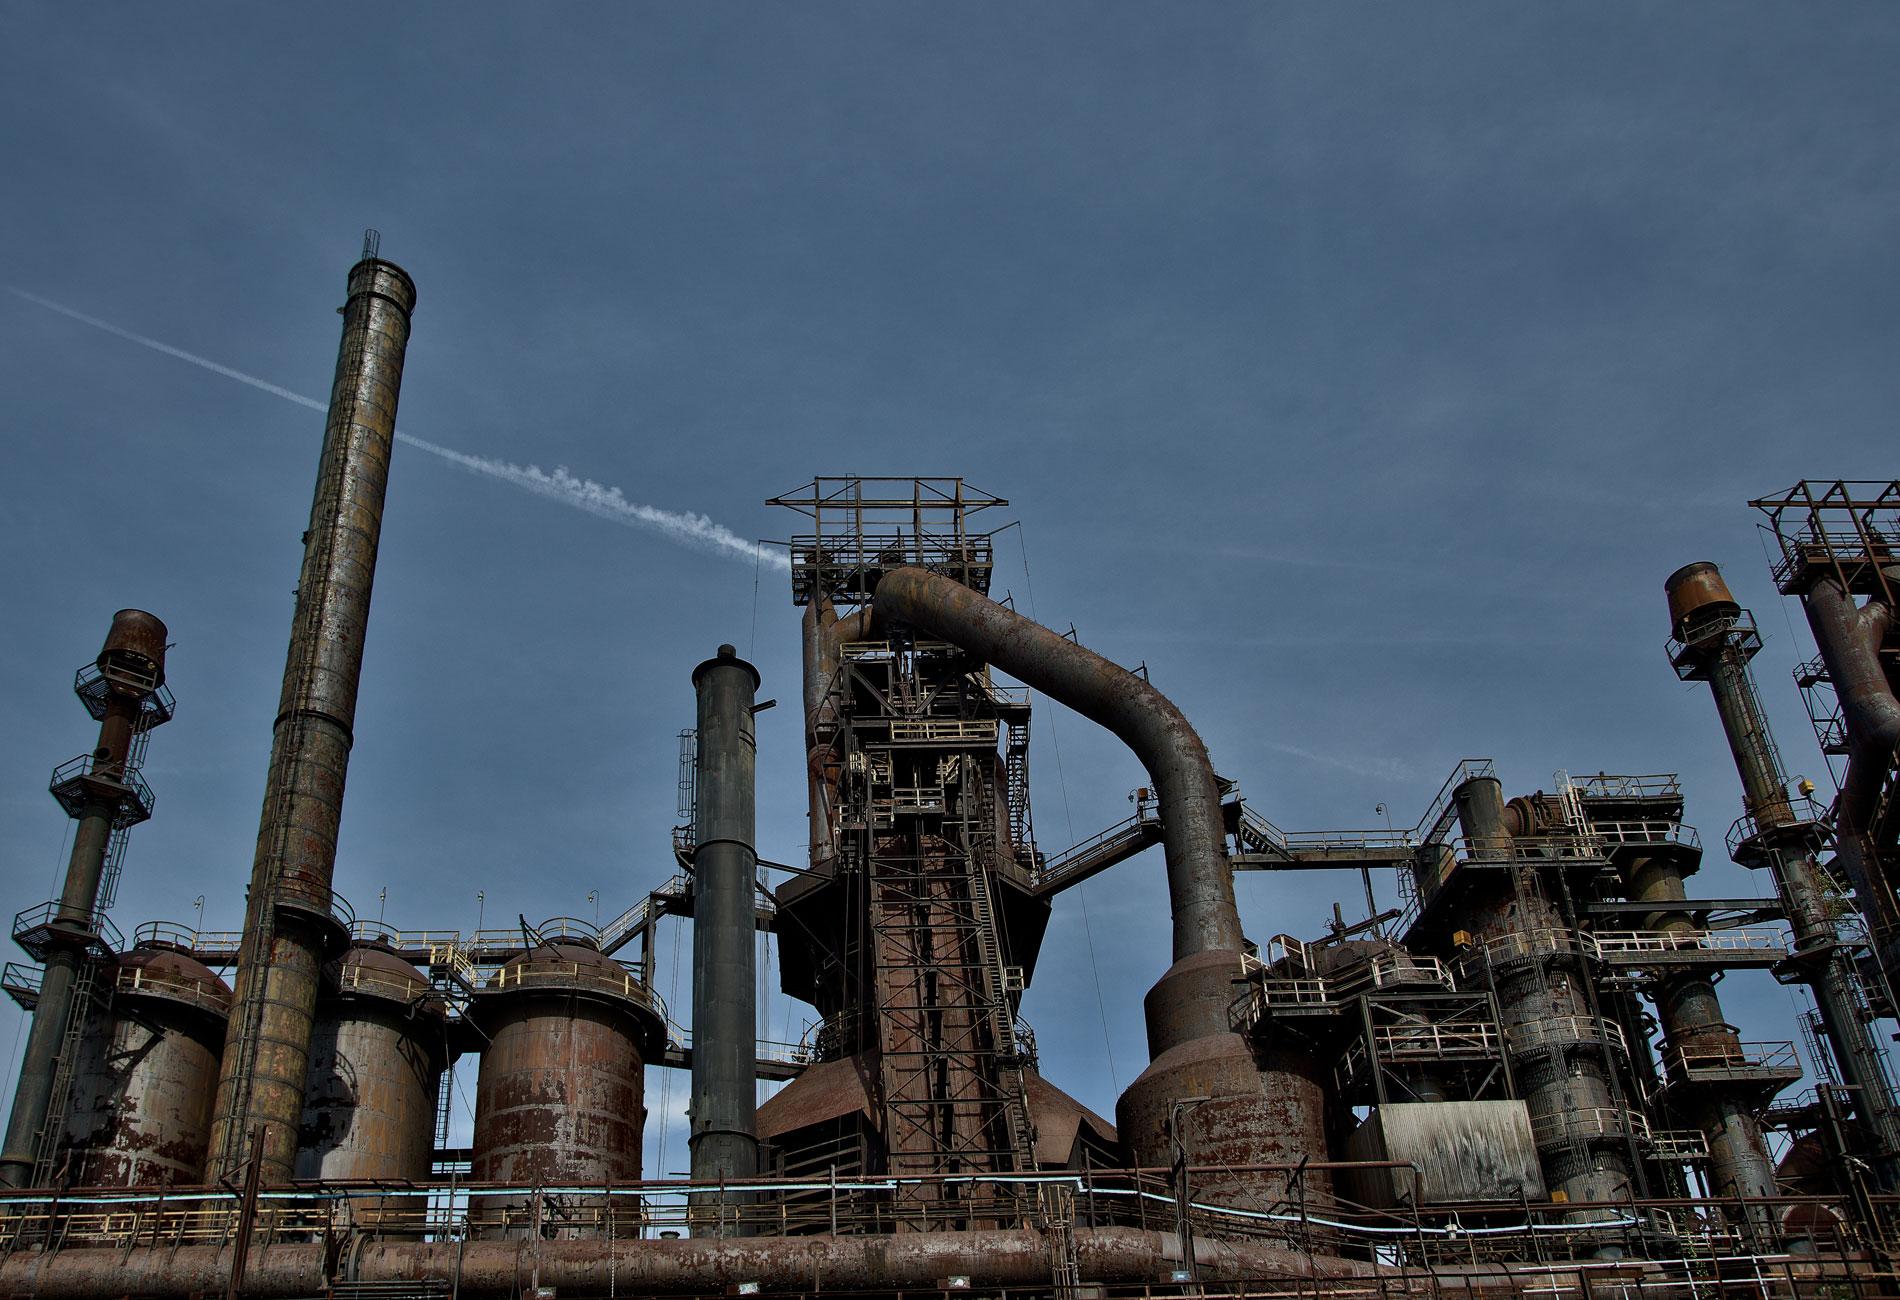 Bethlehem Steel Stacks - Iconic Pic